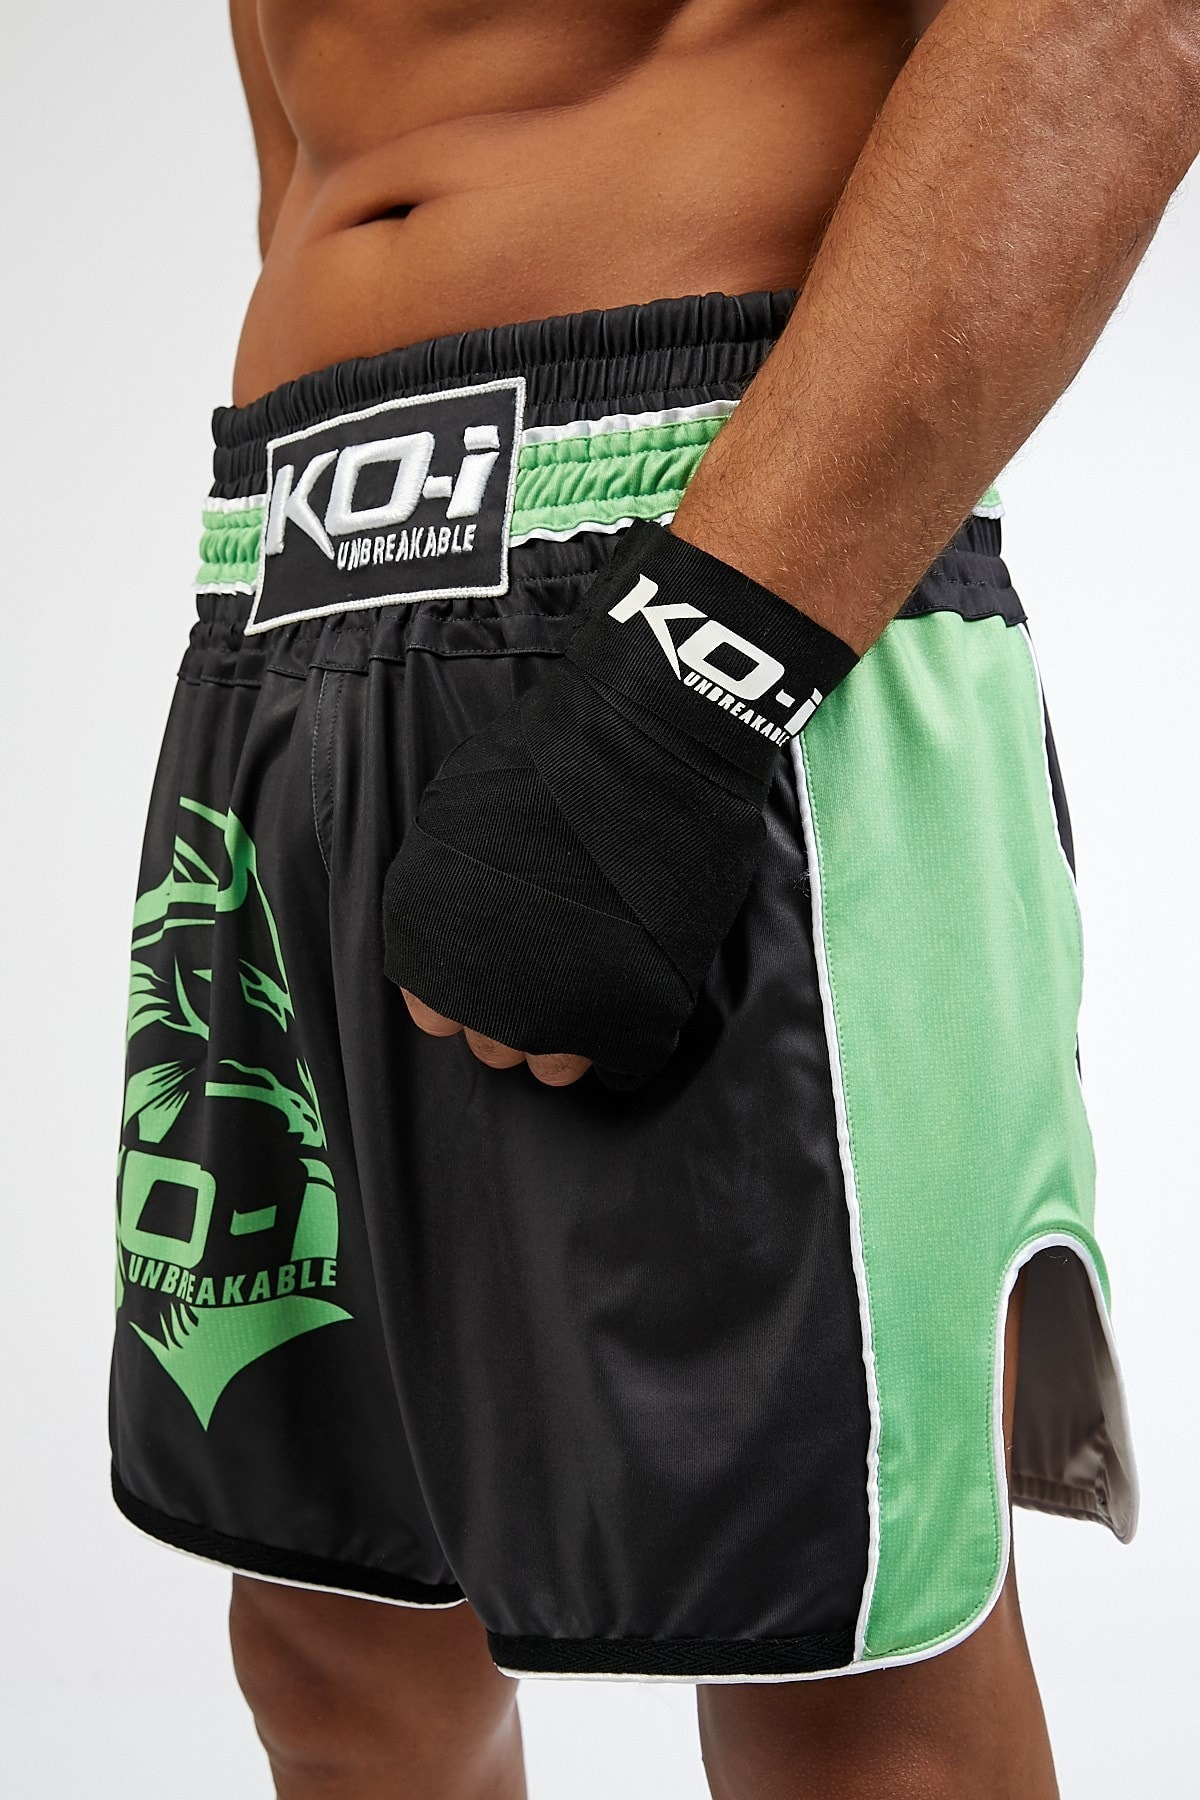 KO-I FIGHT Ko-ı Neon Logo Traınıng Short, Antreman Şortu 2